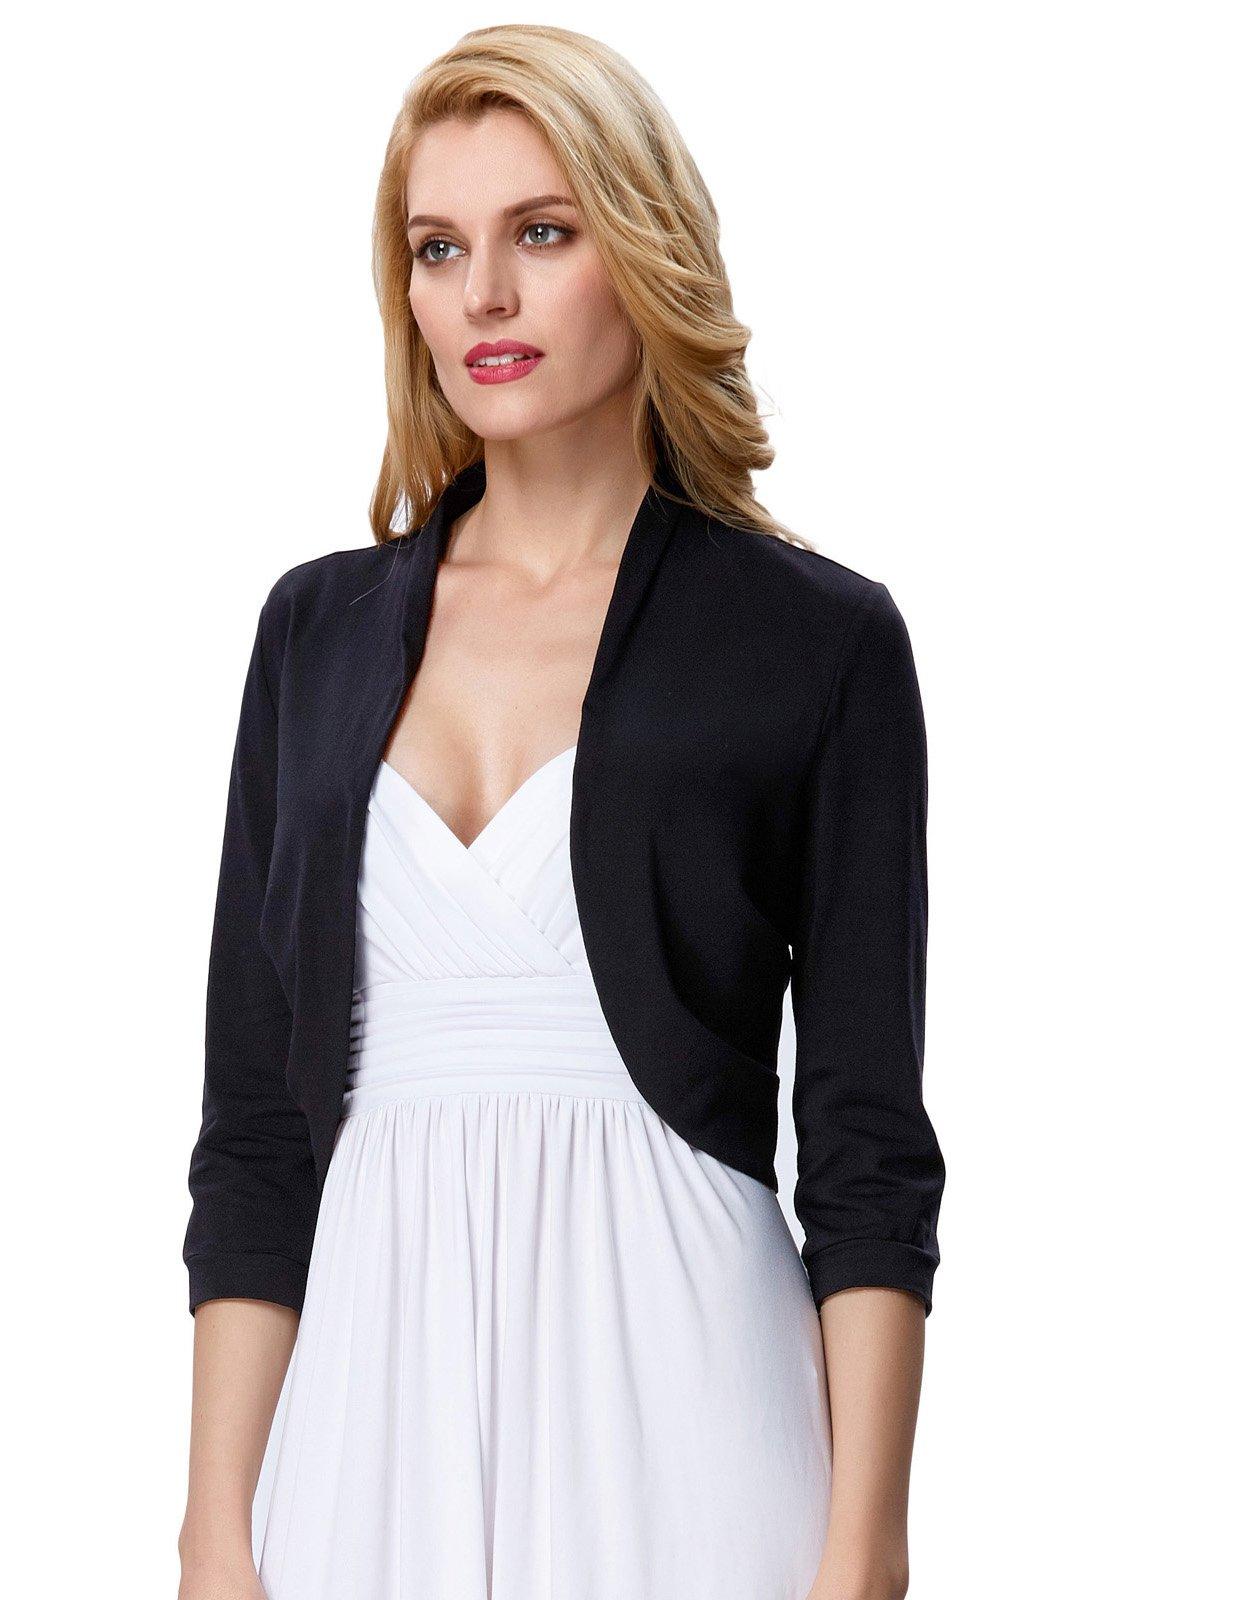 Spring Black Cropped Wedding Bolero Jacket Plain(XL, Black 512-1) by JS Fashion Vintage Dress (Image #5)